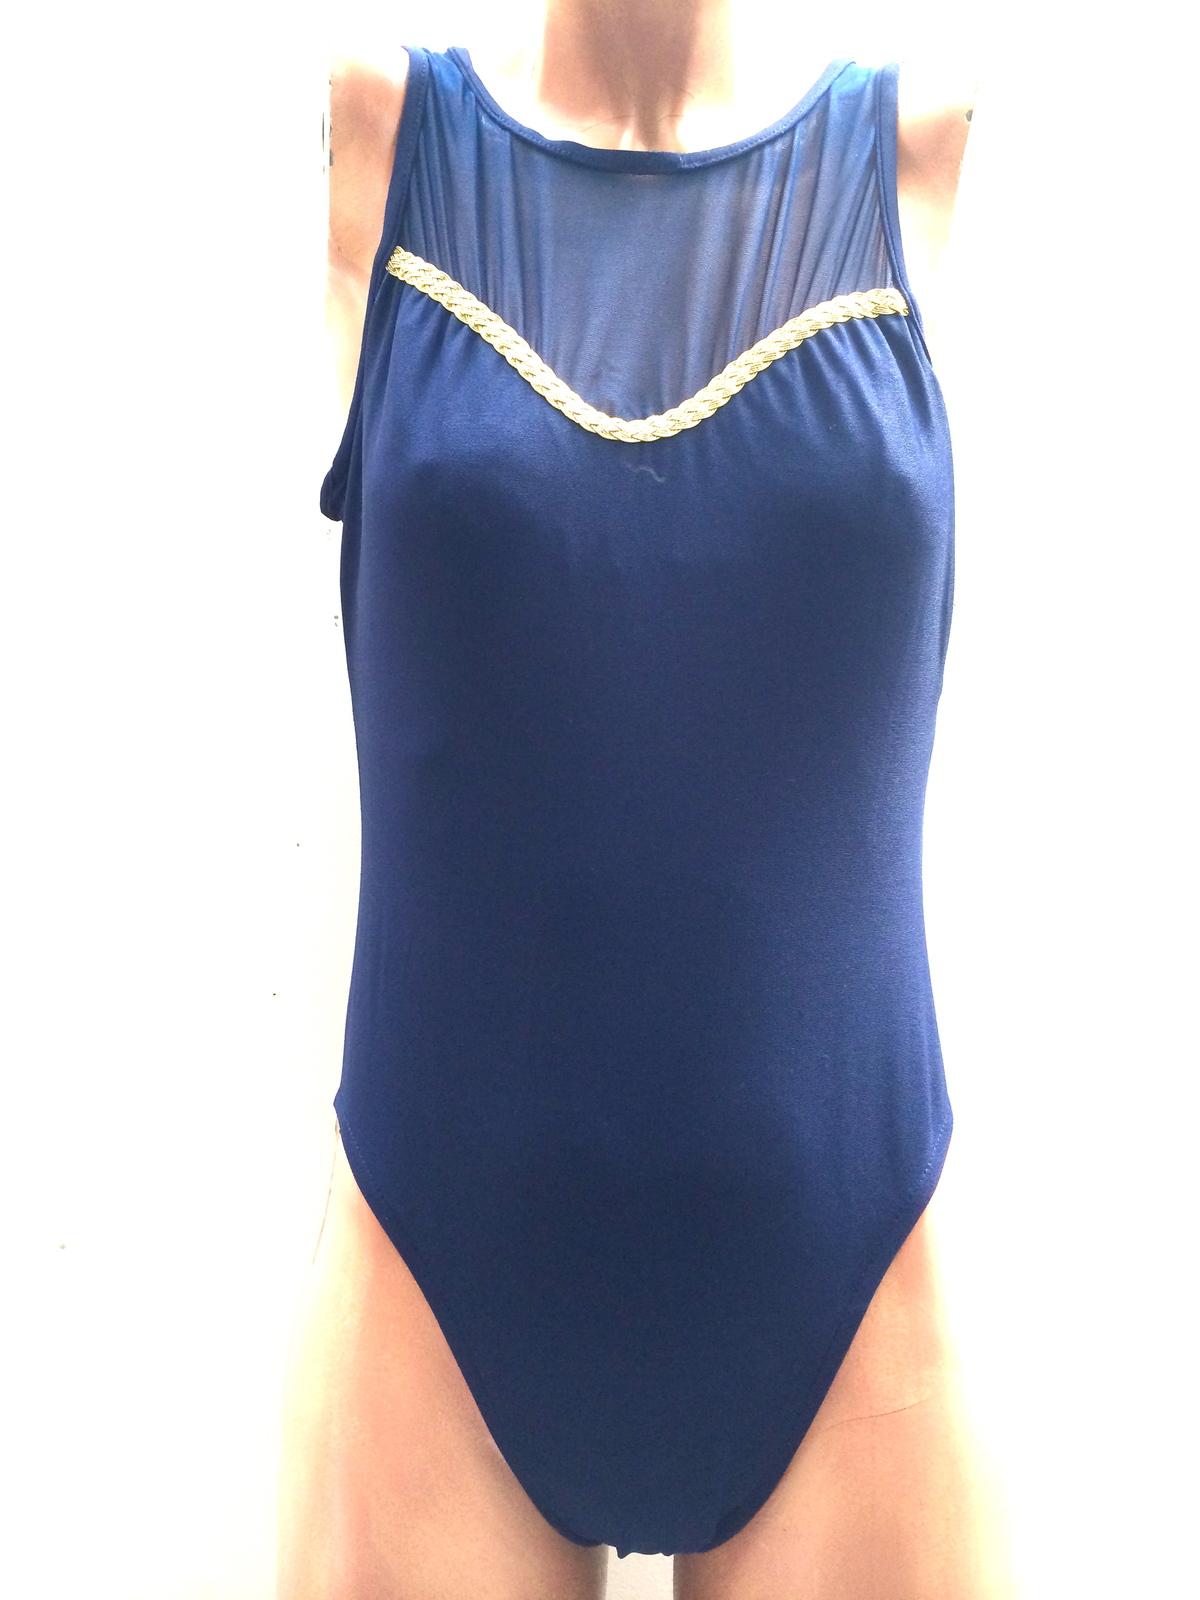 f96989464e0 Img 3821. Img 3821. Previous. Kathy Ireland Navy Blue Gold One Piece  Bathing Suit Authentic Vintage Swimwear. Kathy Ireland ...